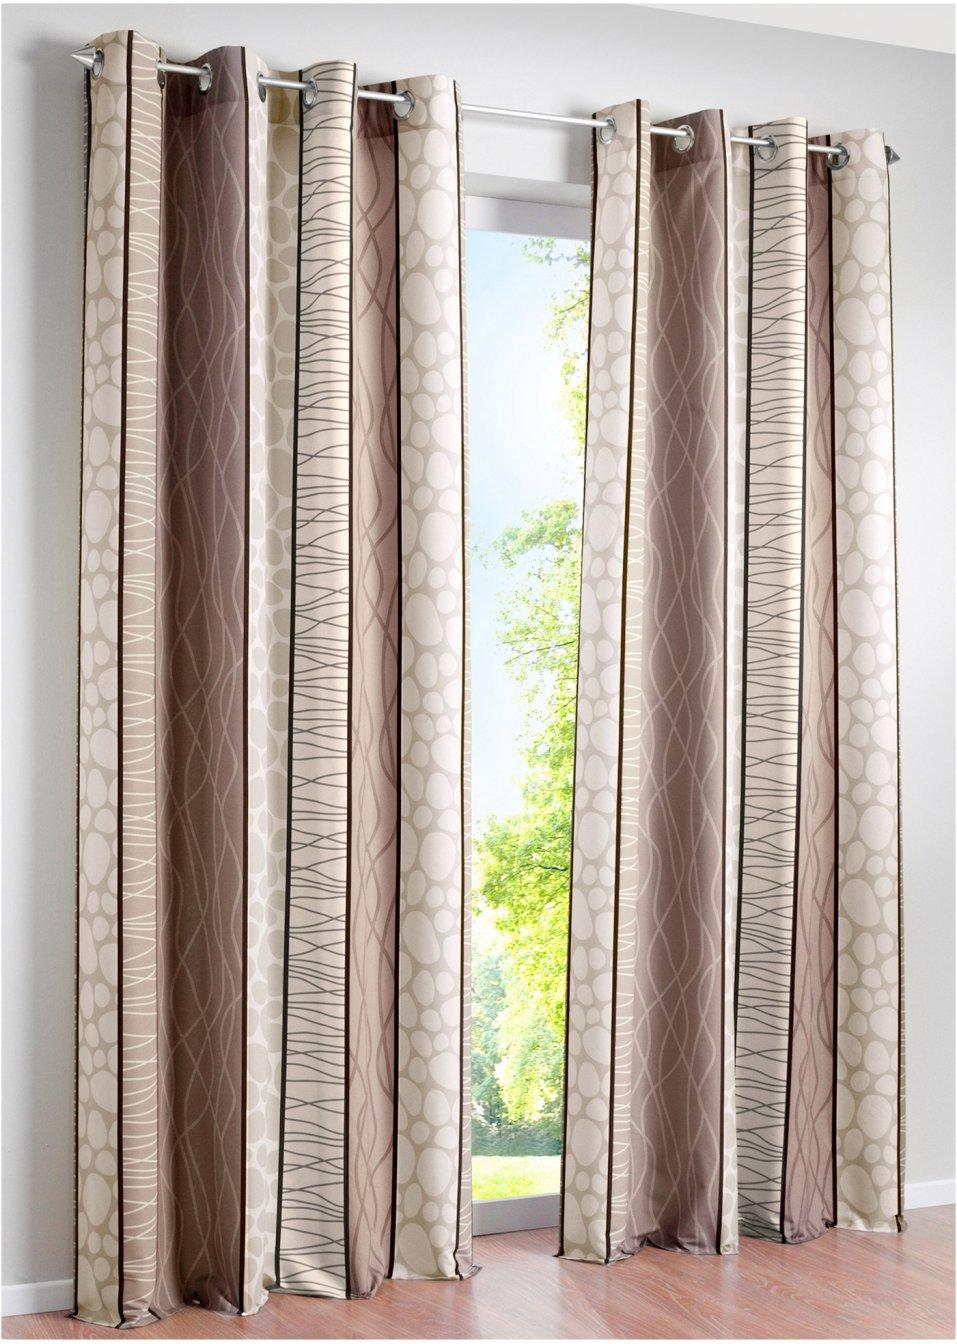 sch nes und zeitloses design mit dem bedruckten vorhang estelle taupe sen 1er pack. Black Bedroom Furniture Sets. Home Design Ideas